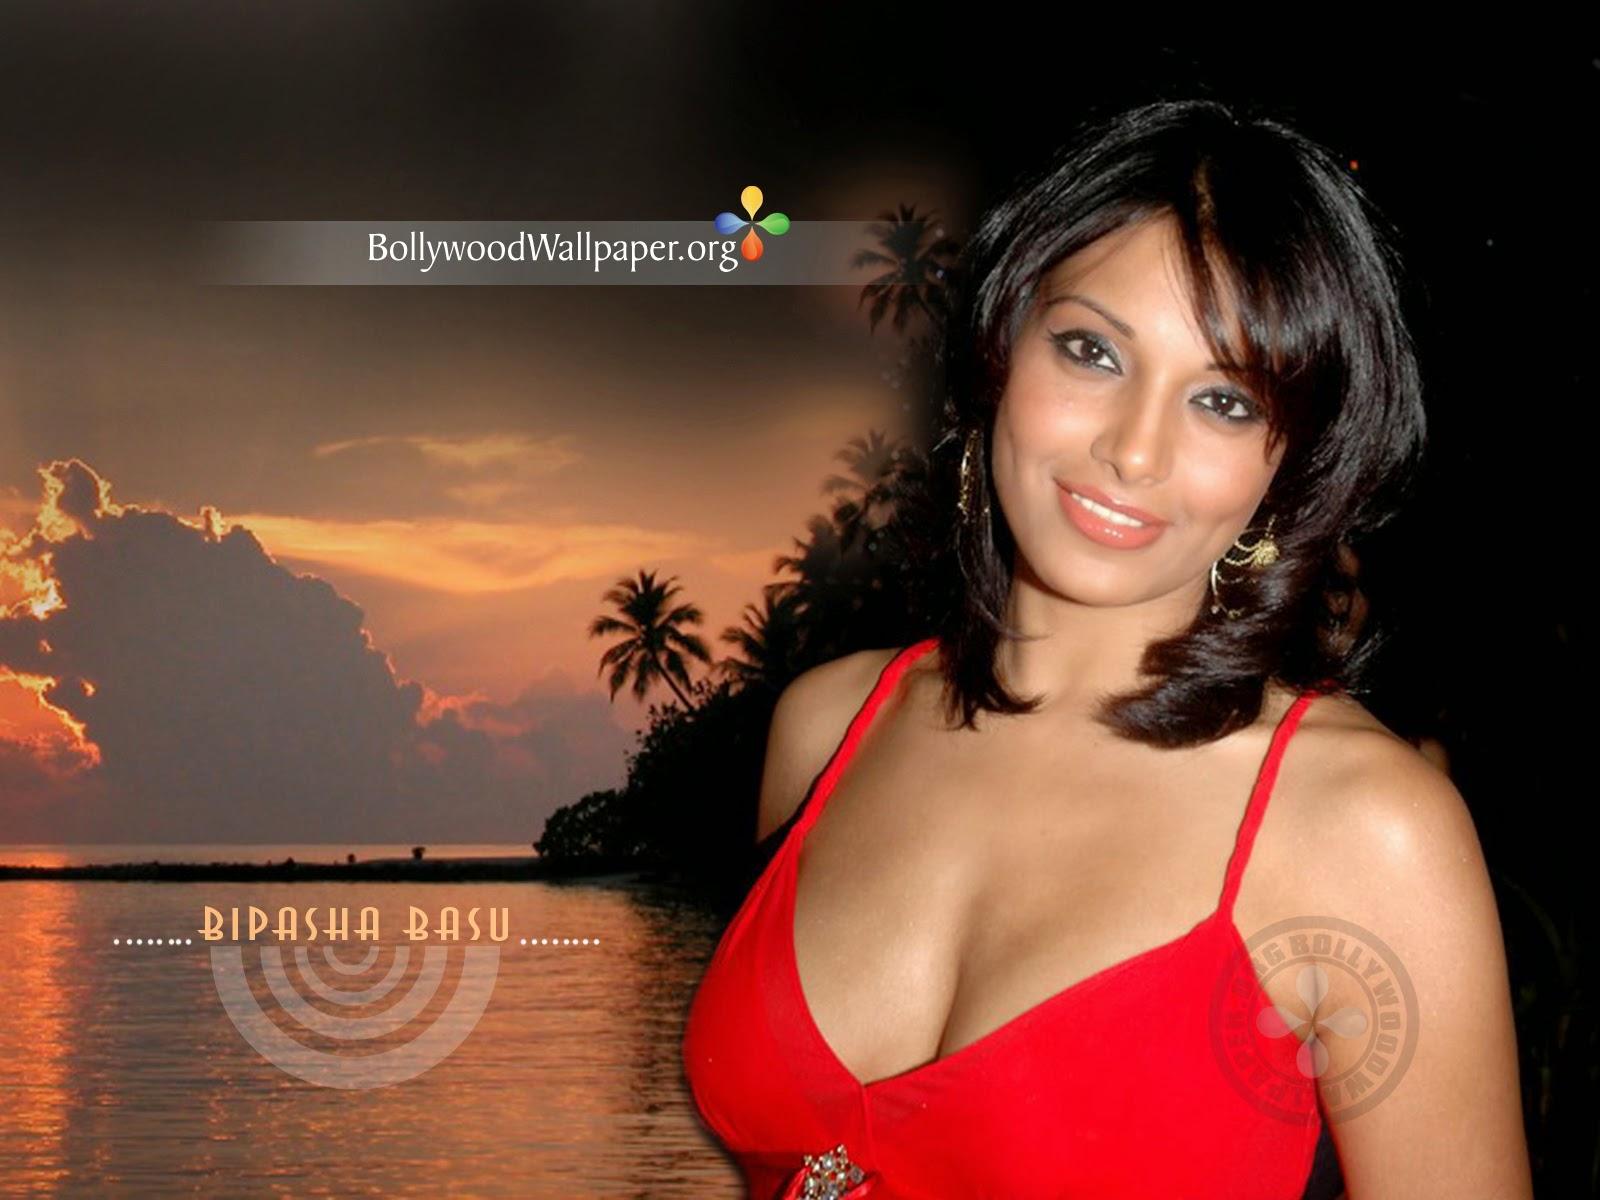 Free Download Full Hd Wallpaper Bipasha Basu Bollywood -7800